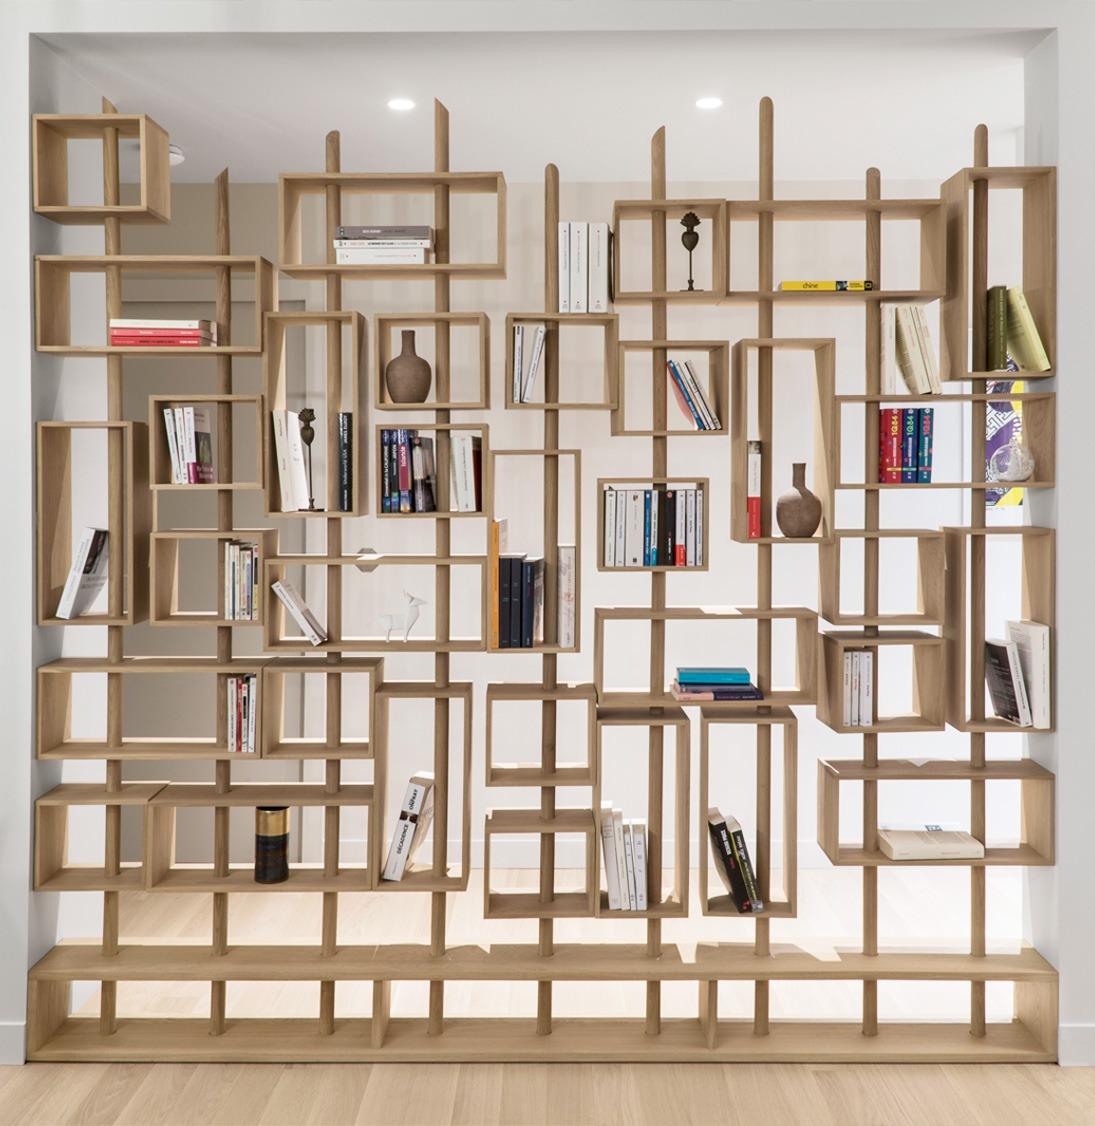 bibliothèque sur mesure meuble made in France